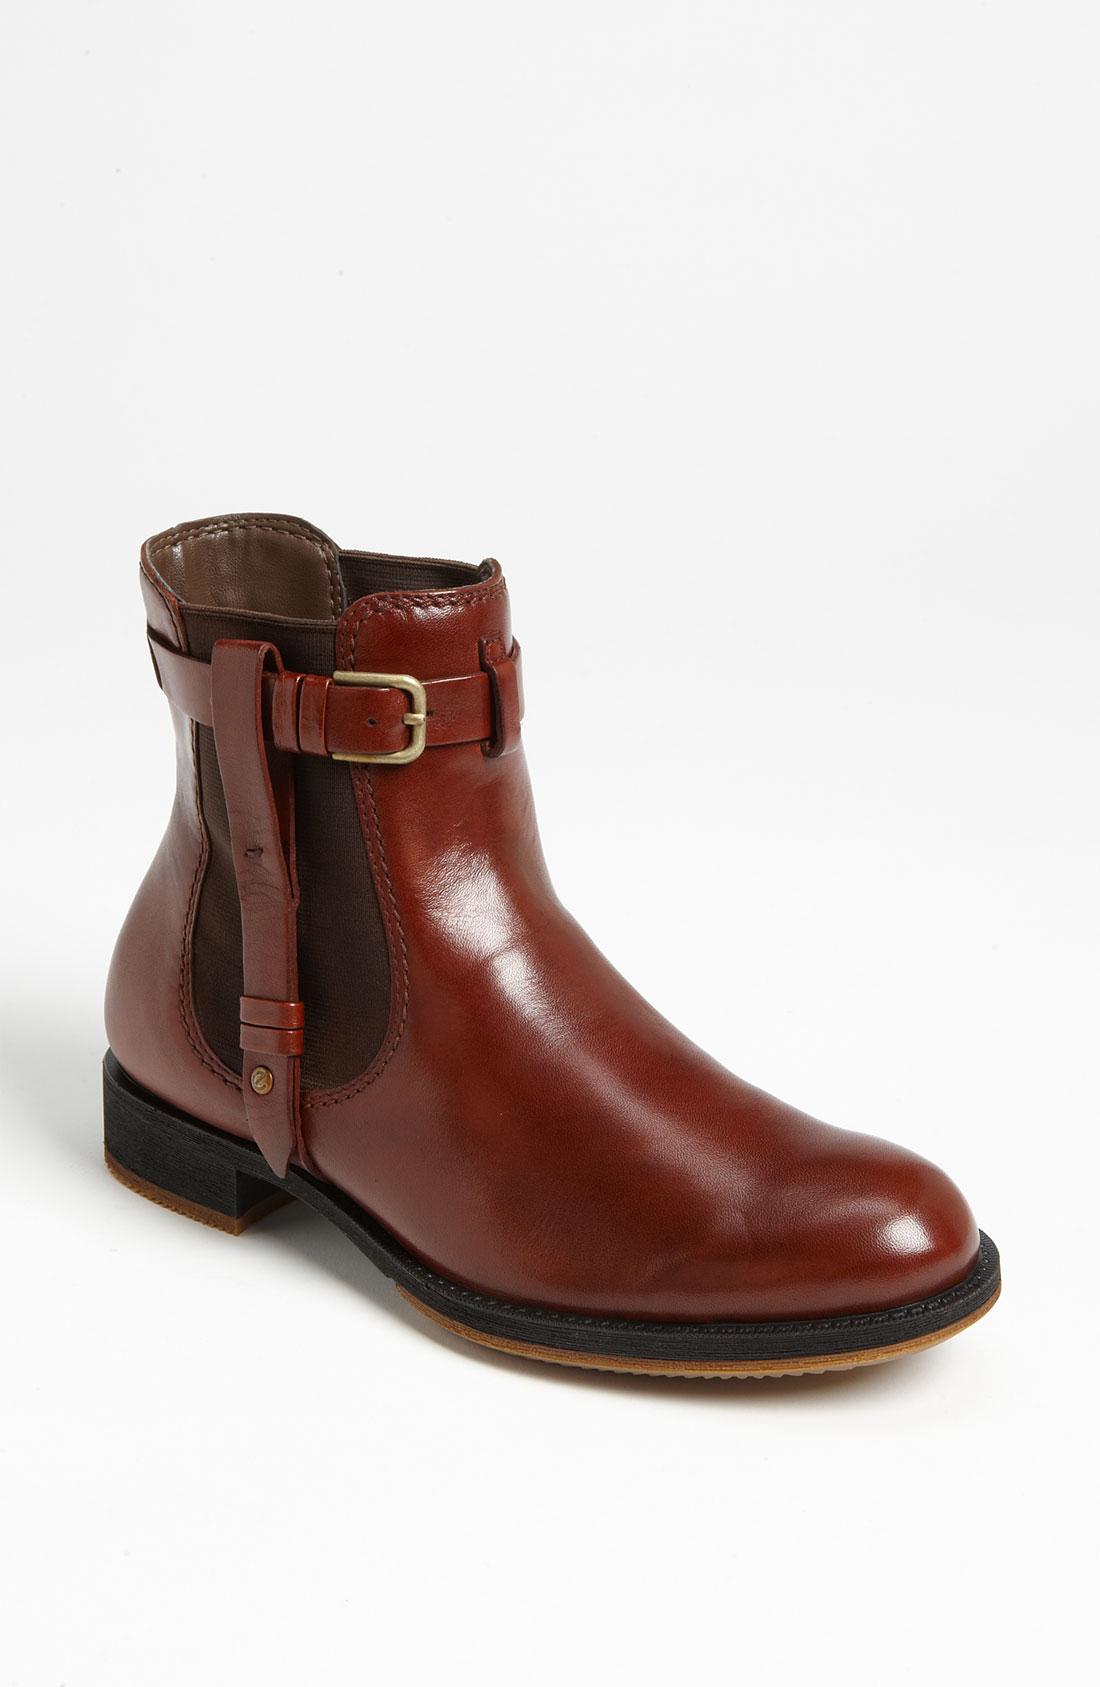 ecco saunter chelsea boot in brown cognac lyst. Black Bedroom Furniture Sets. Home Design Ideas